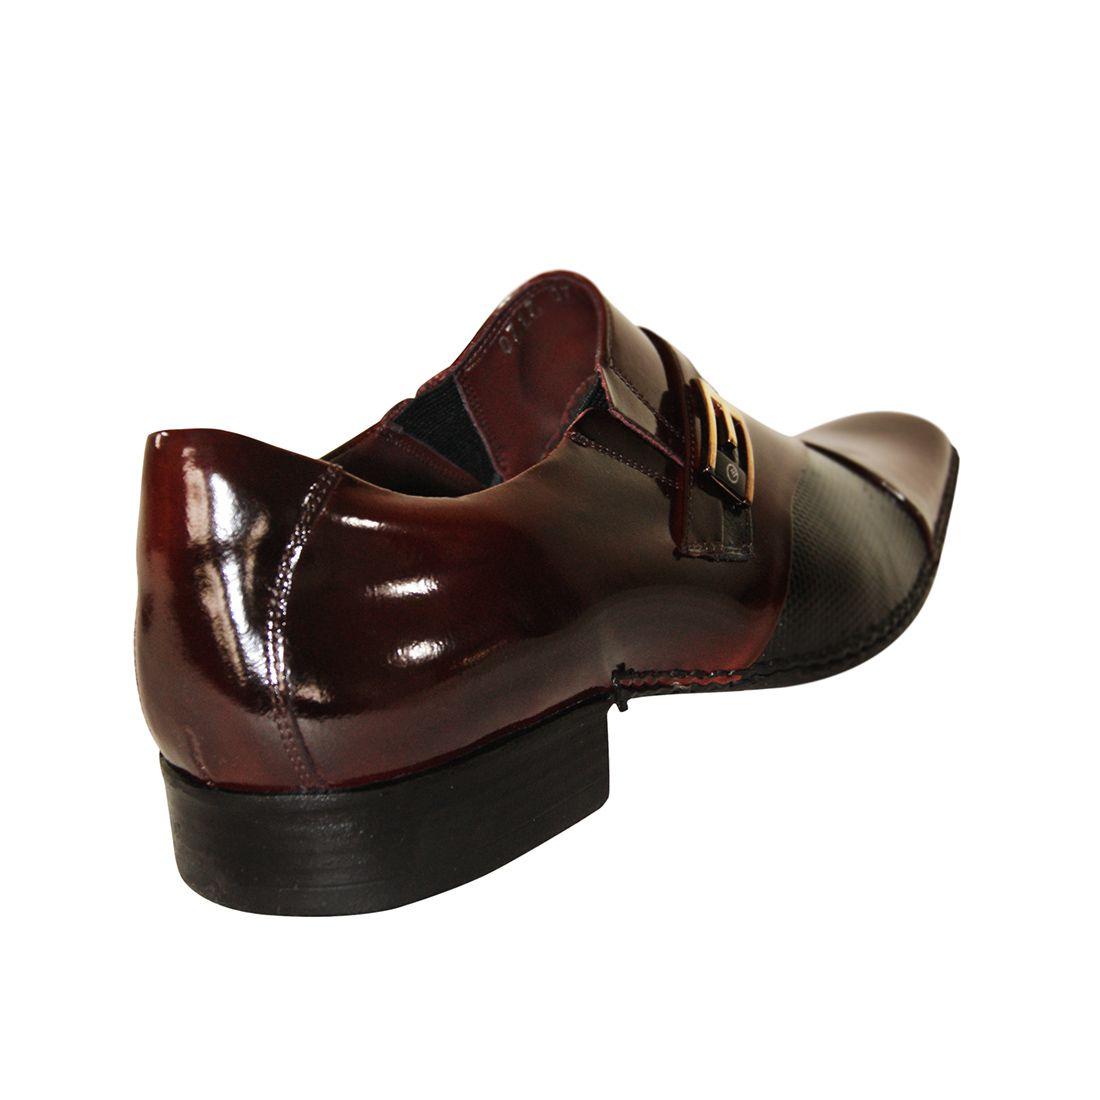 Sapato Social Gofer Couro Verniz Premium Texturizado